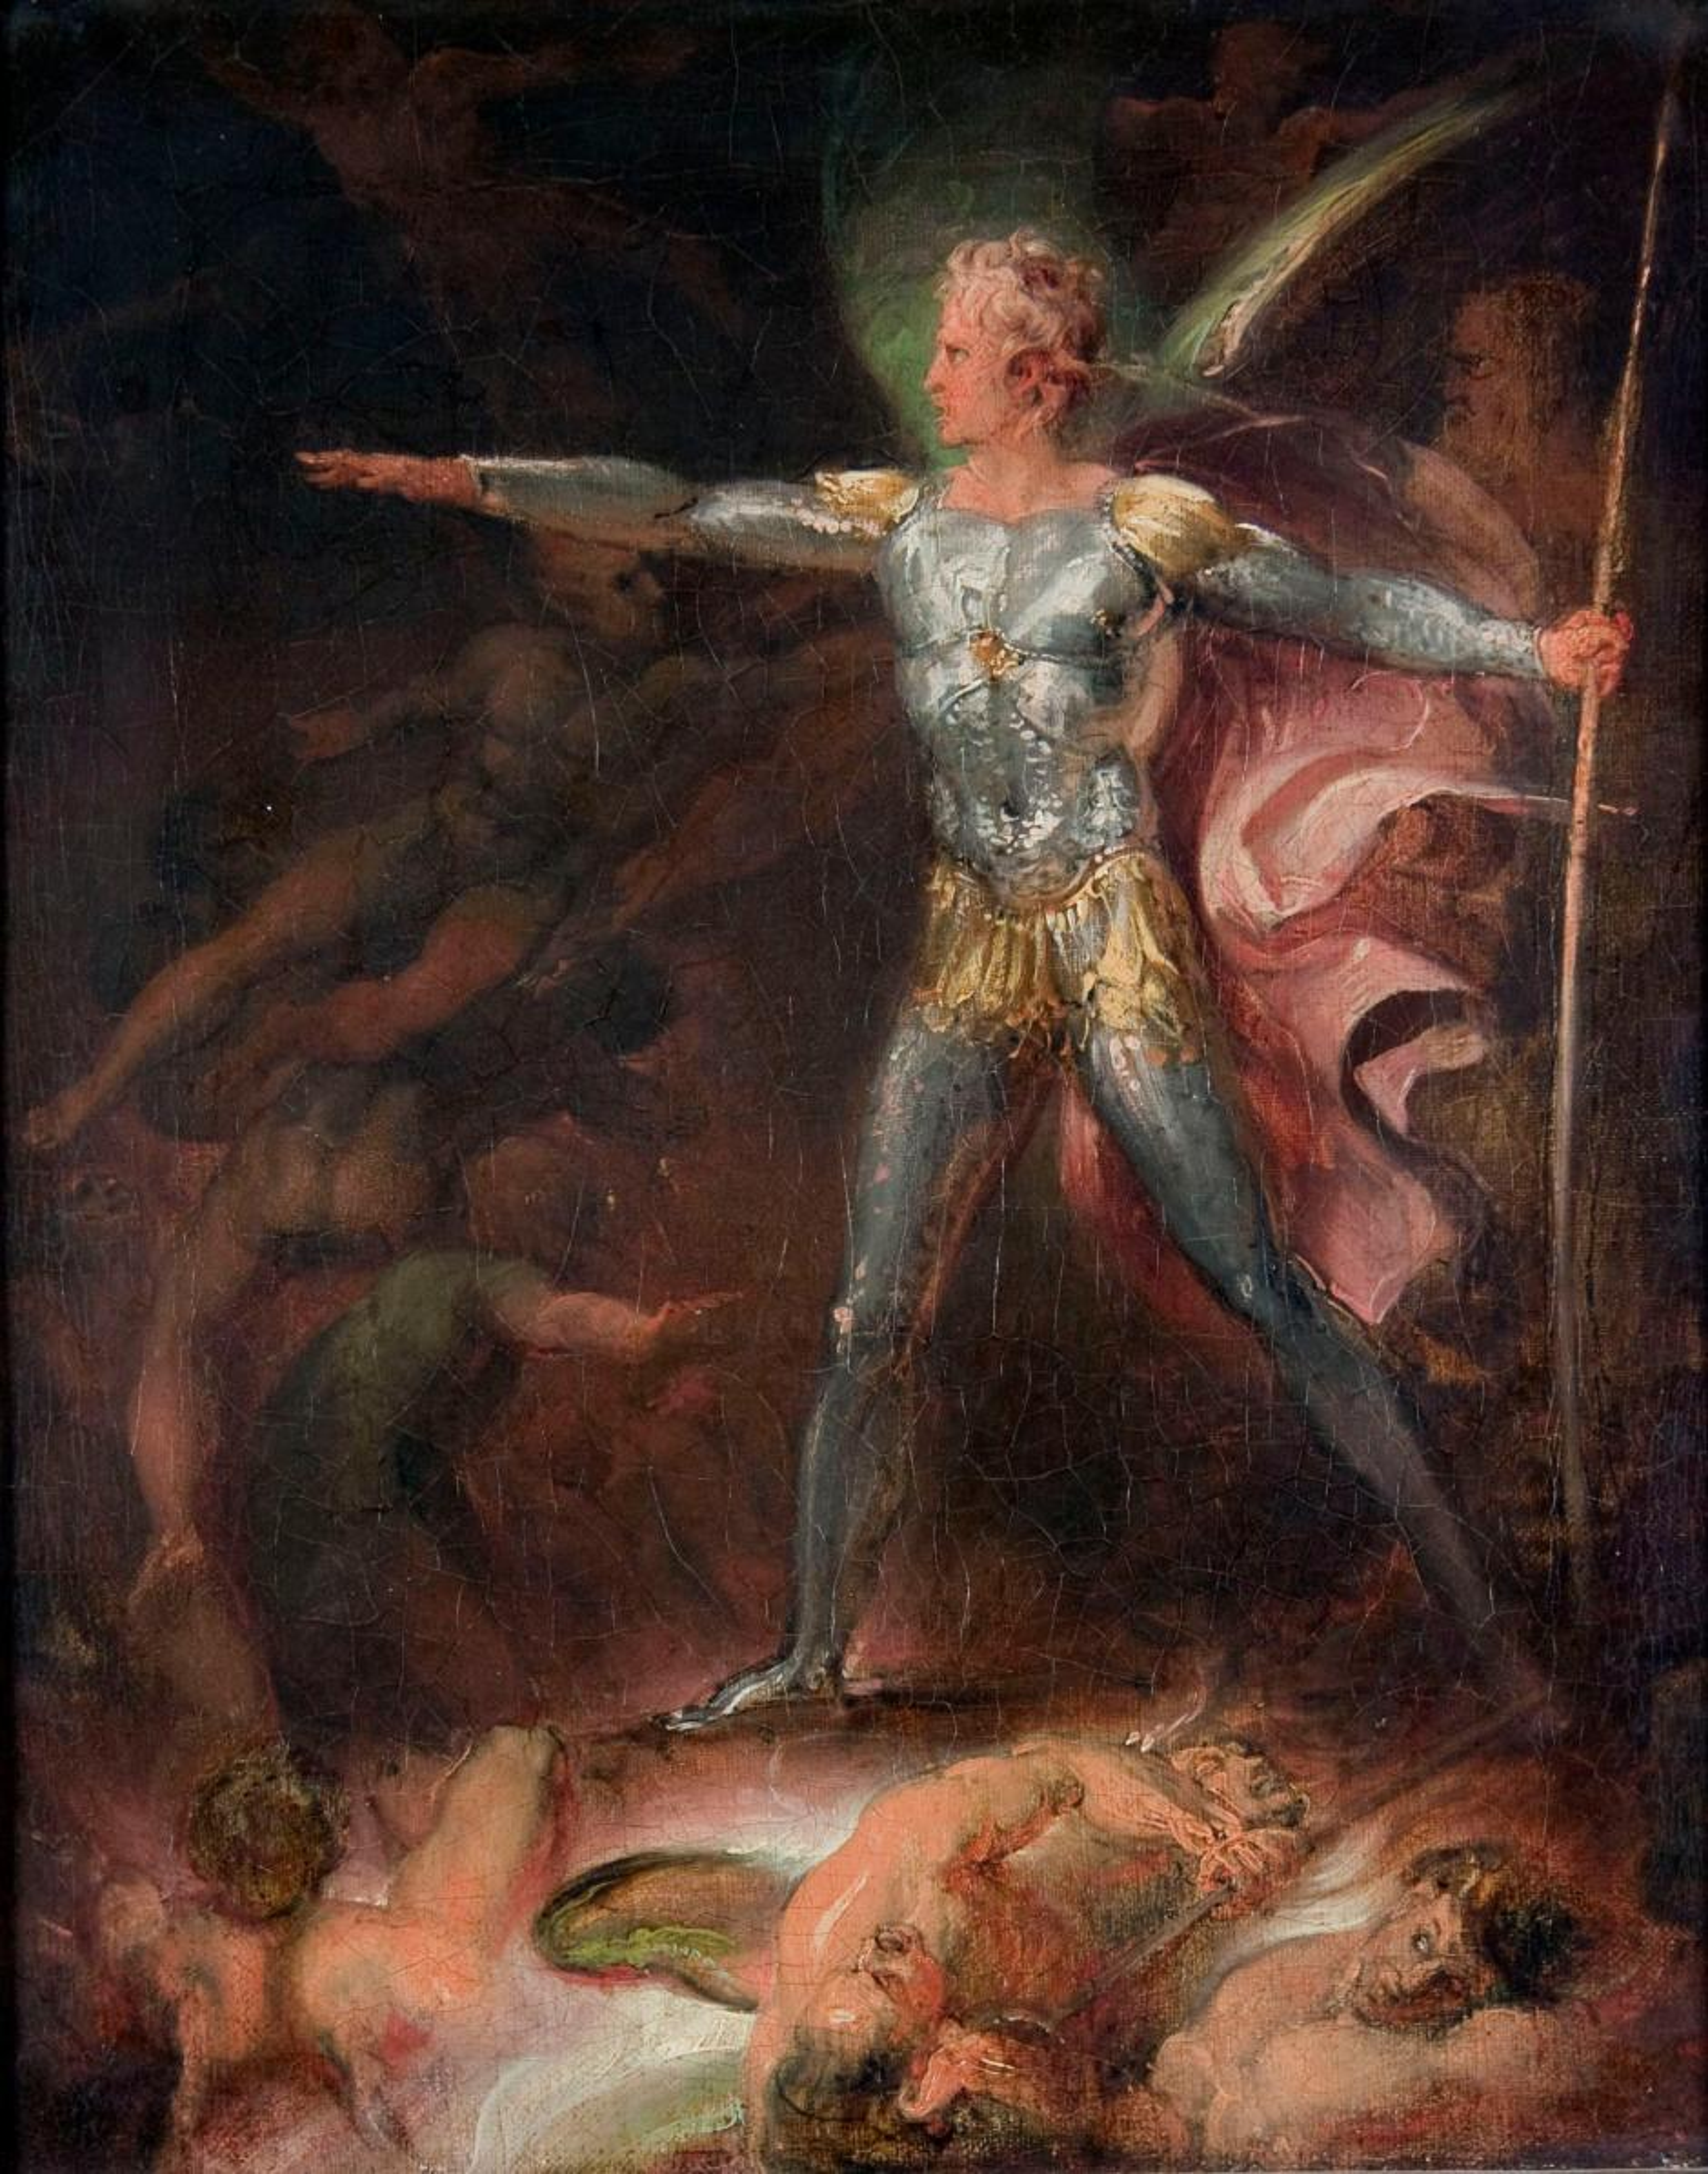 Supernatural Four Horsemen Of The Apocalypse - 0425